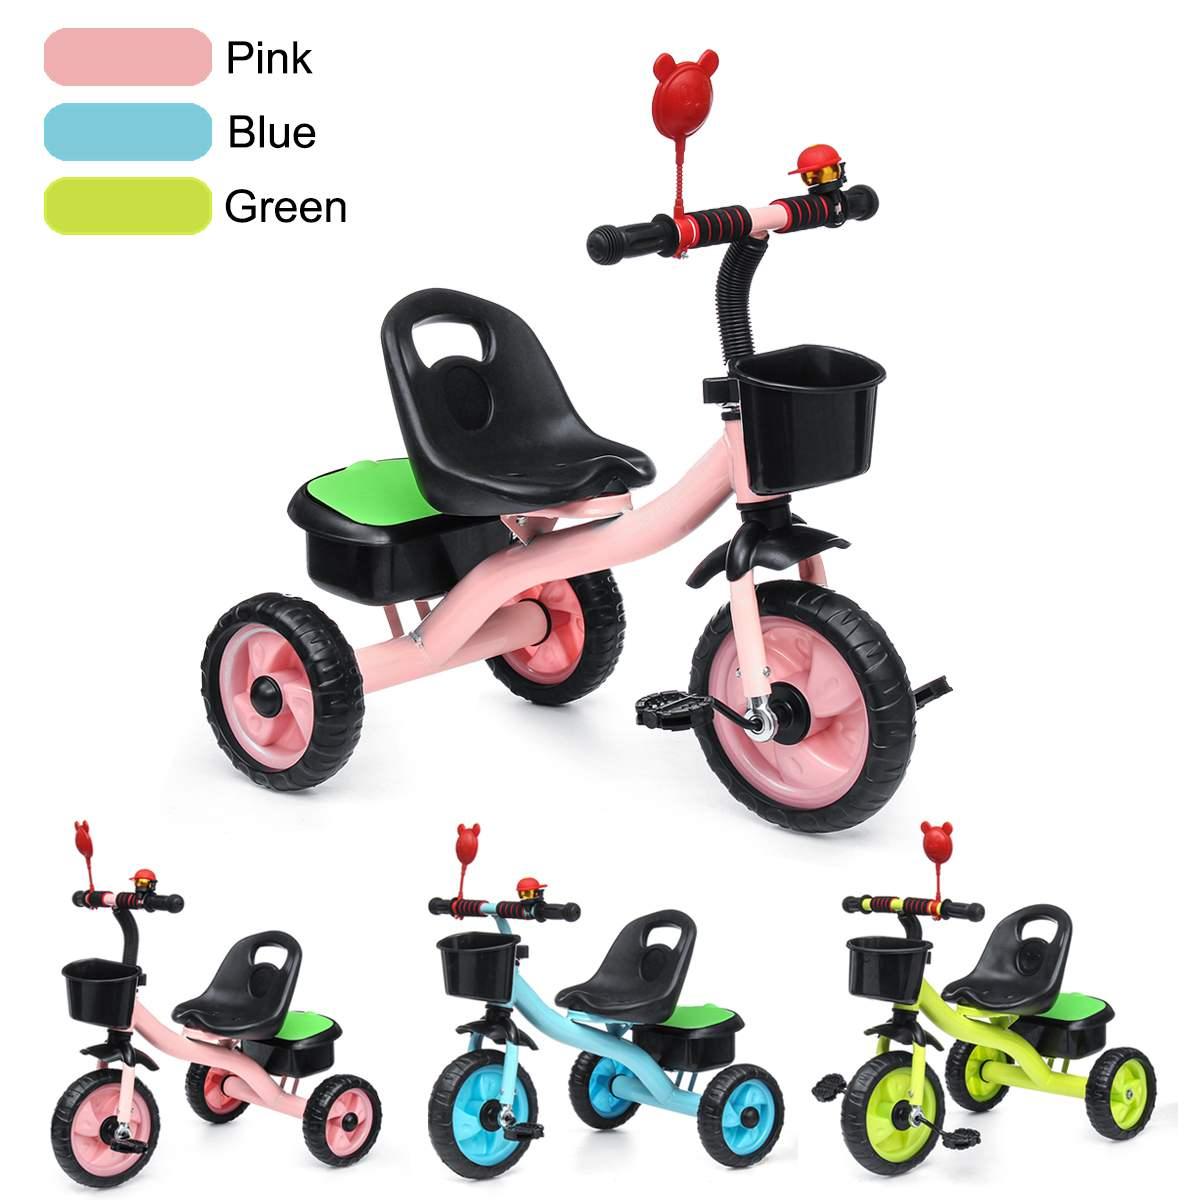 Kids Children Child Tricycle Bicycle 3 Wheel  Kindergarten Kids Ride On Bike Toddler Trike For 2-6 Years Old Kid